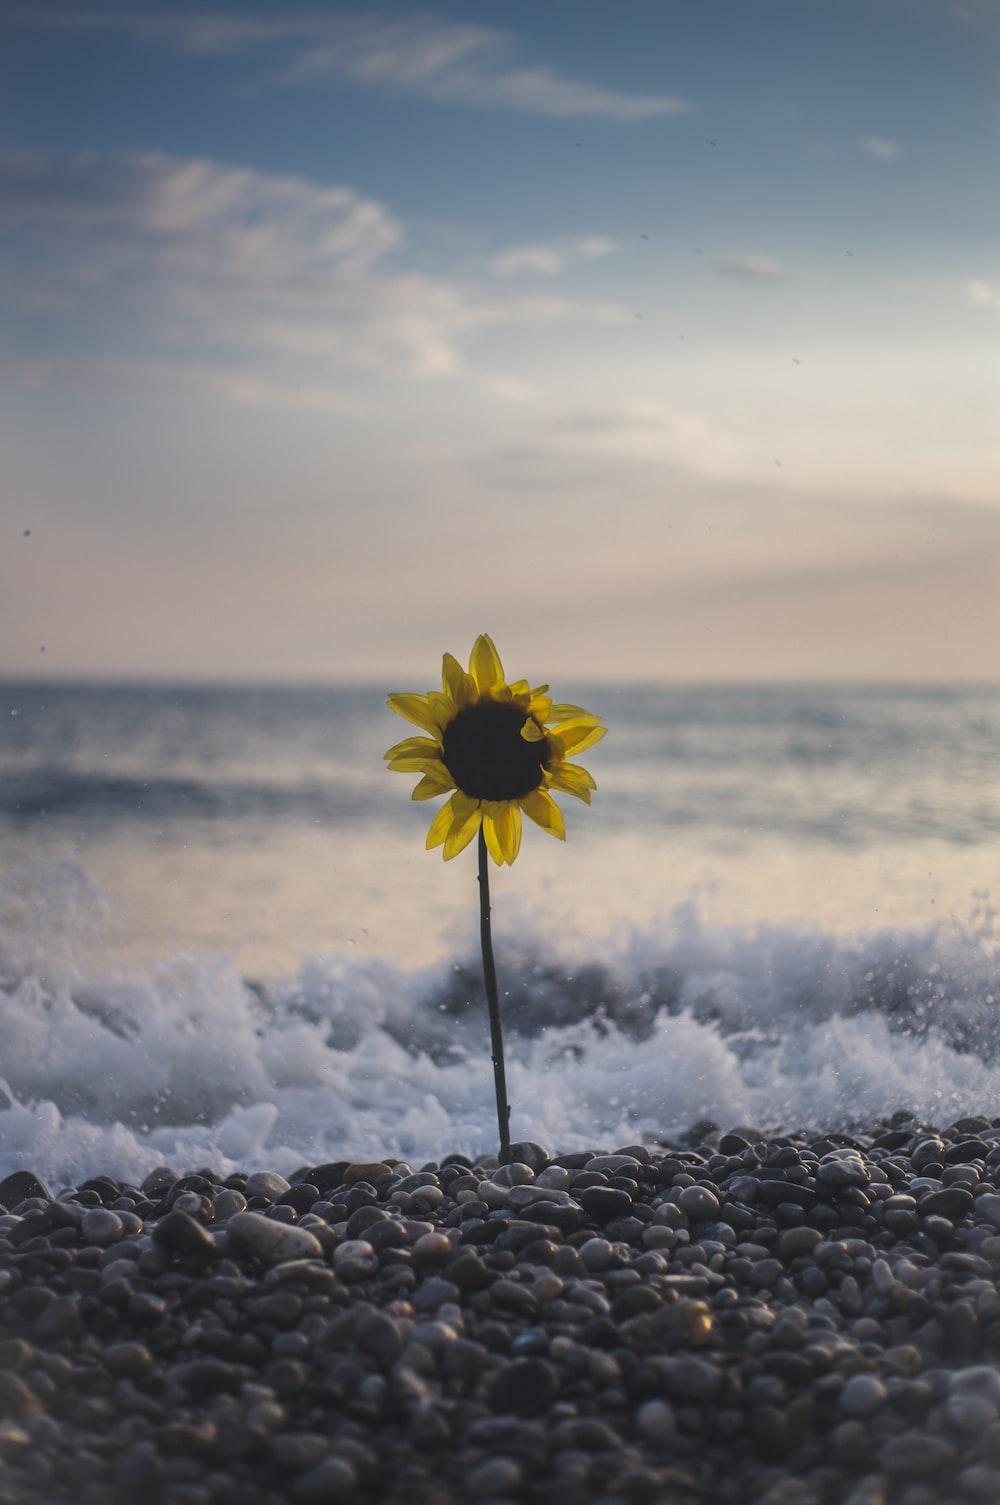 sunflowers on seashore beside wave